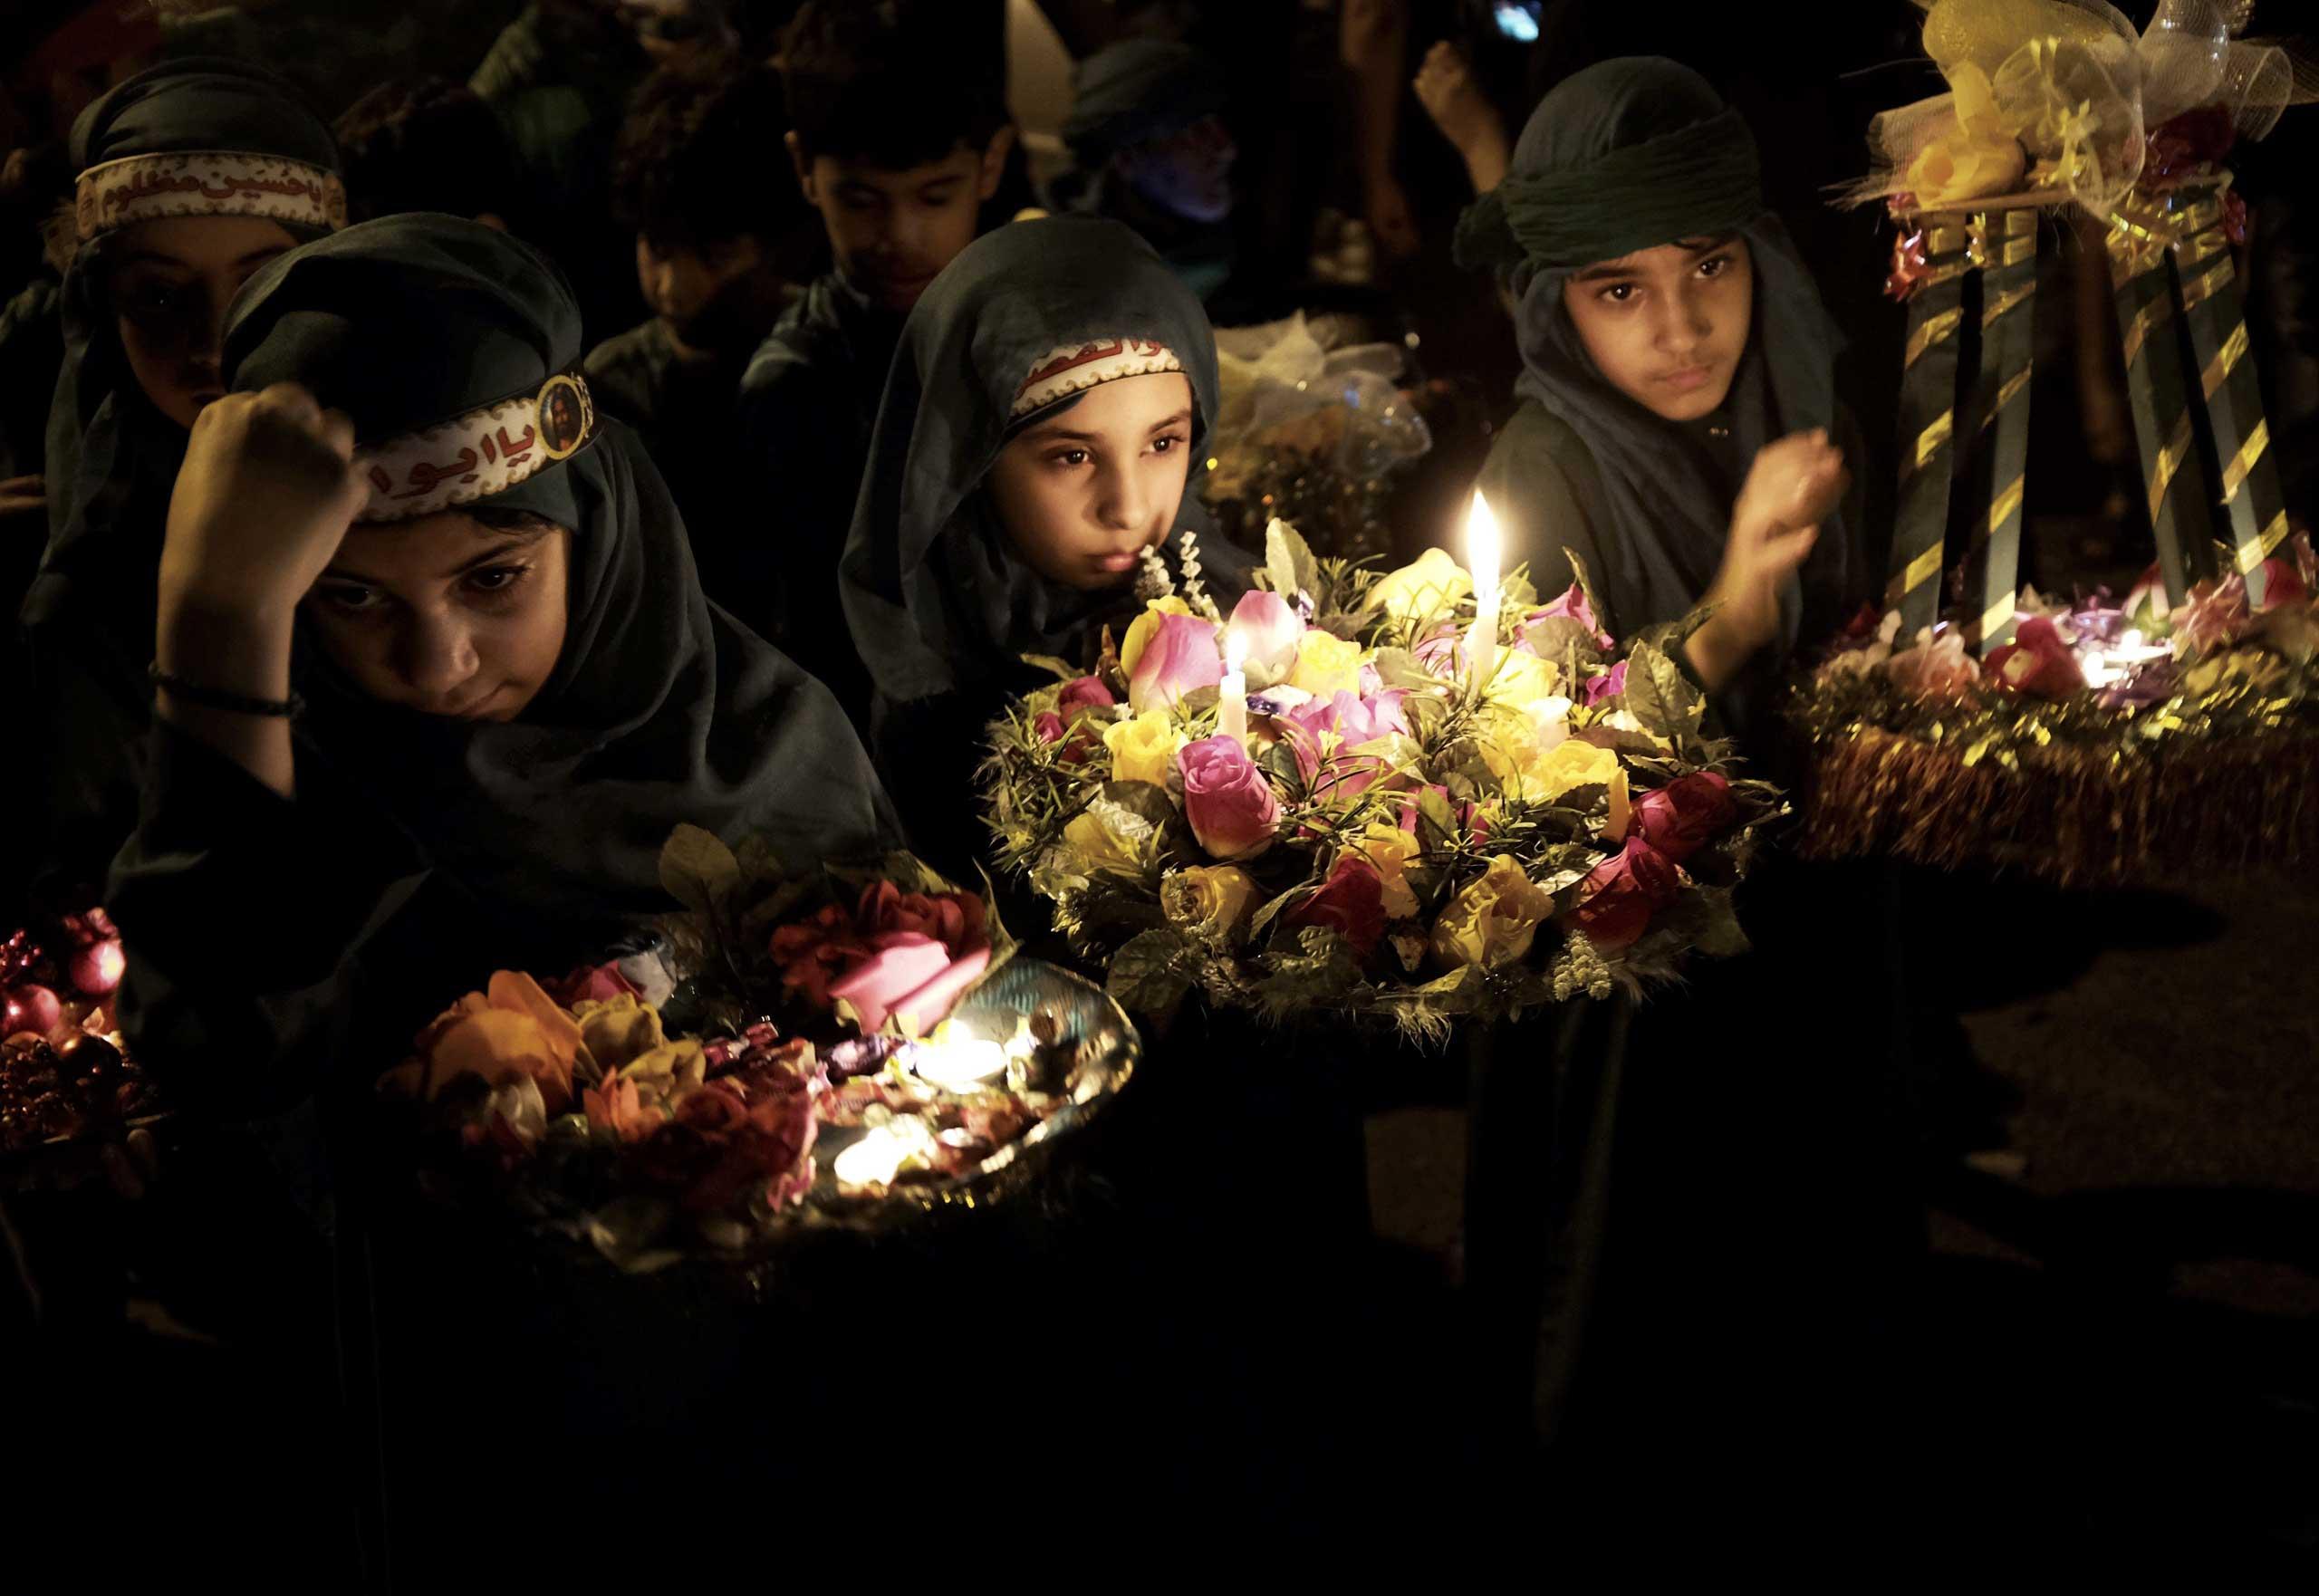 Nov. 1, 2014. Bahraini Shiite Muslim girls take part in a ceremony marking Ashura in the village of Sanabis, west of Manama.